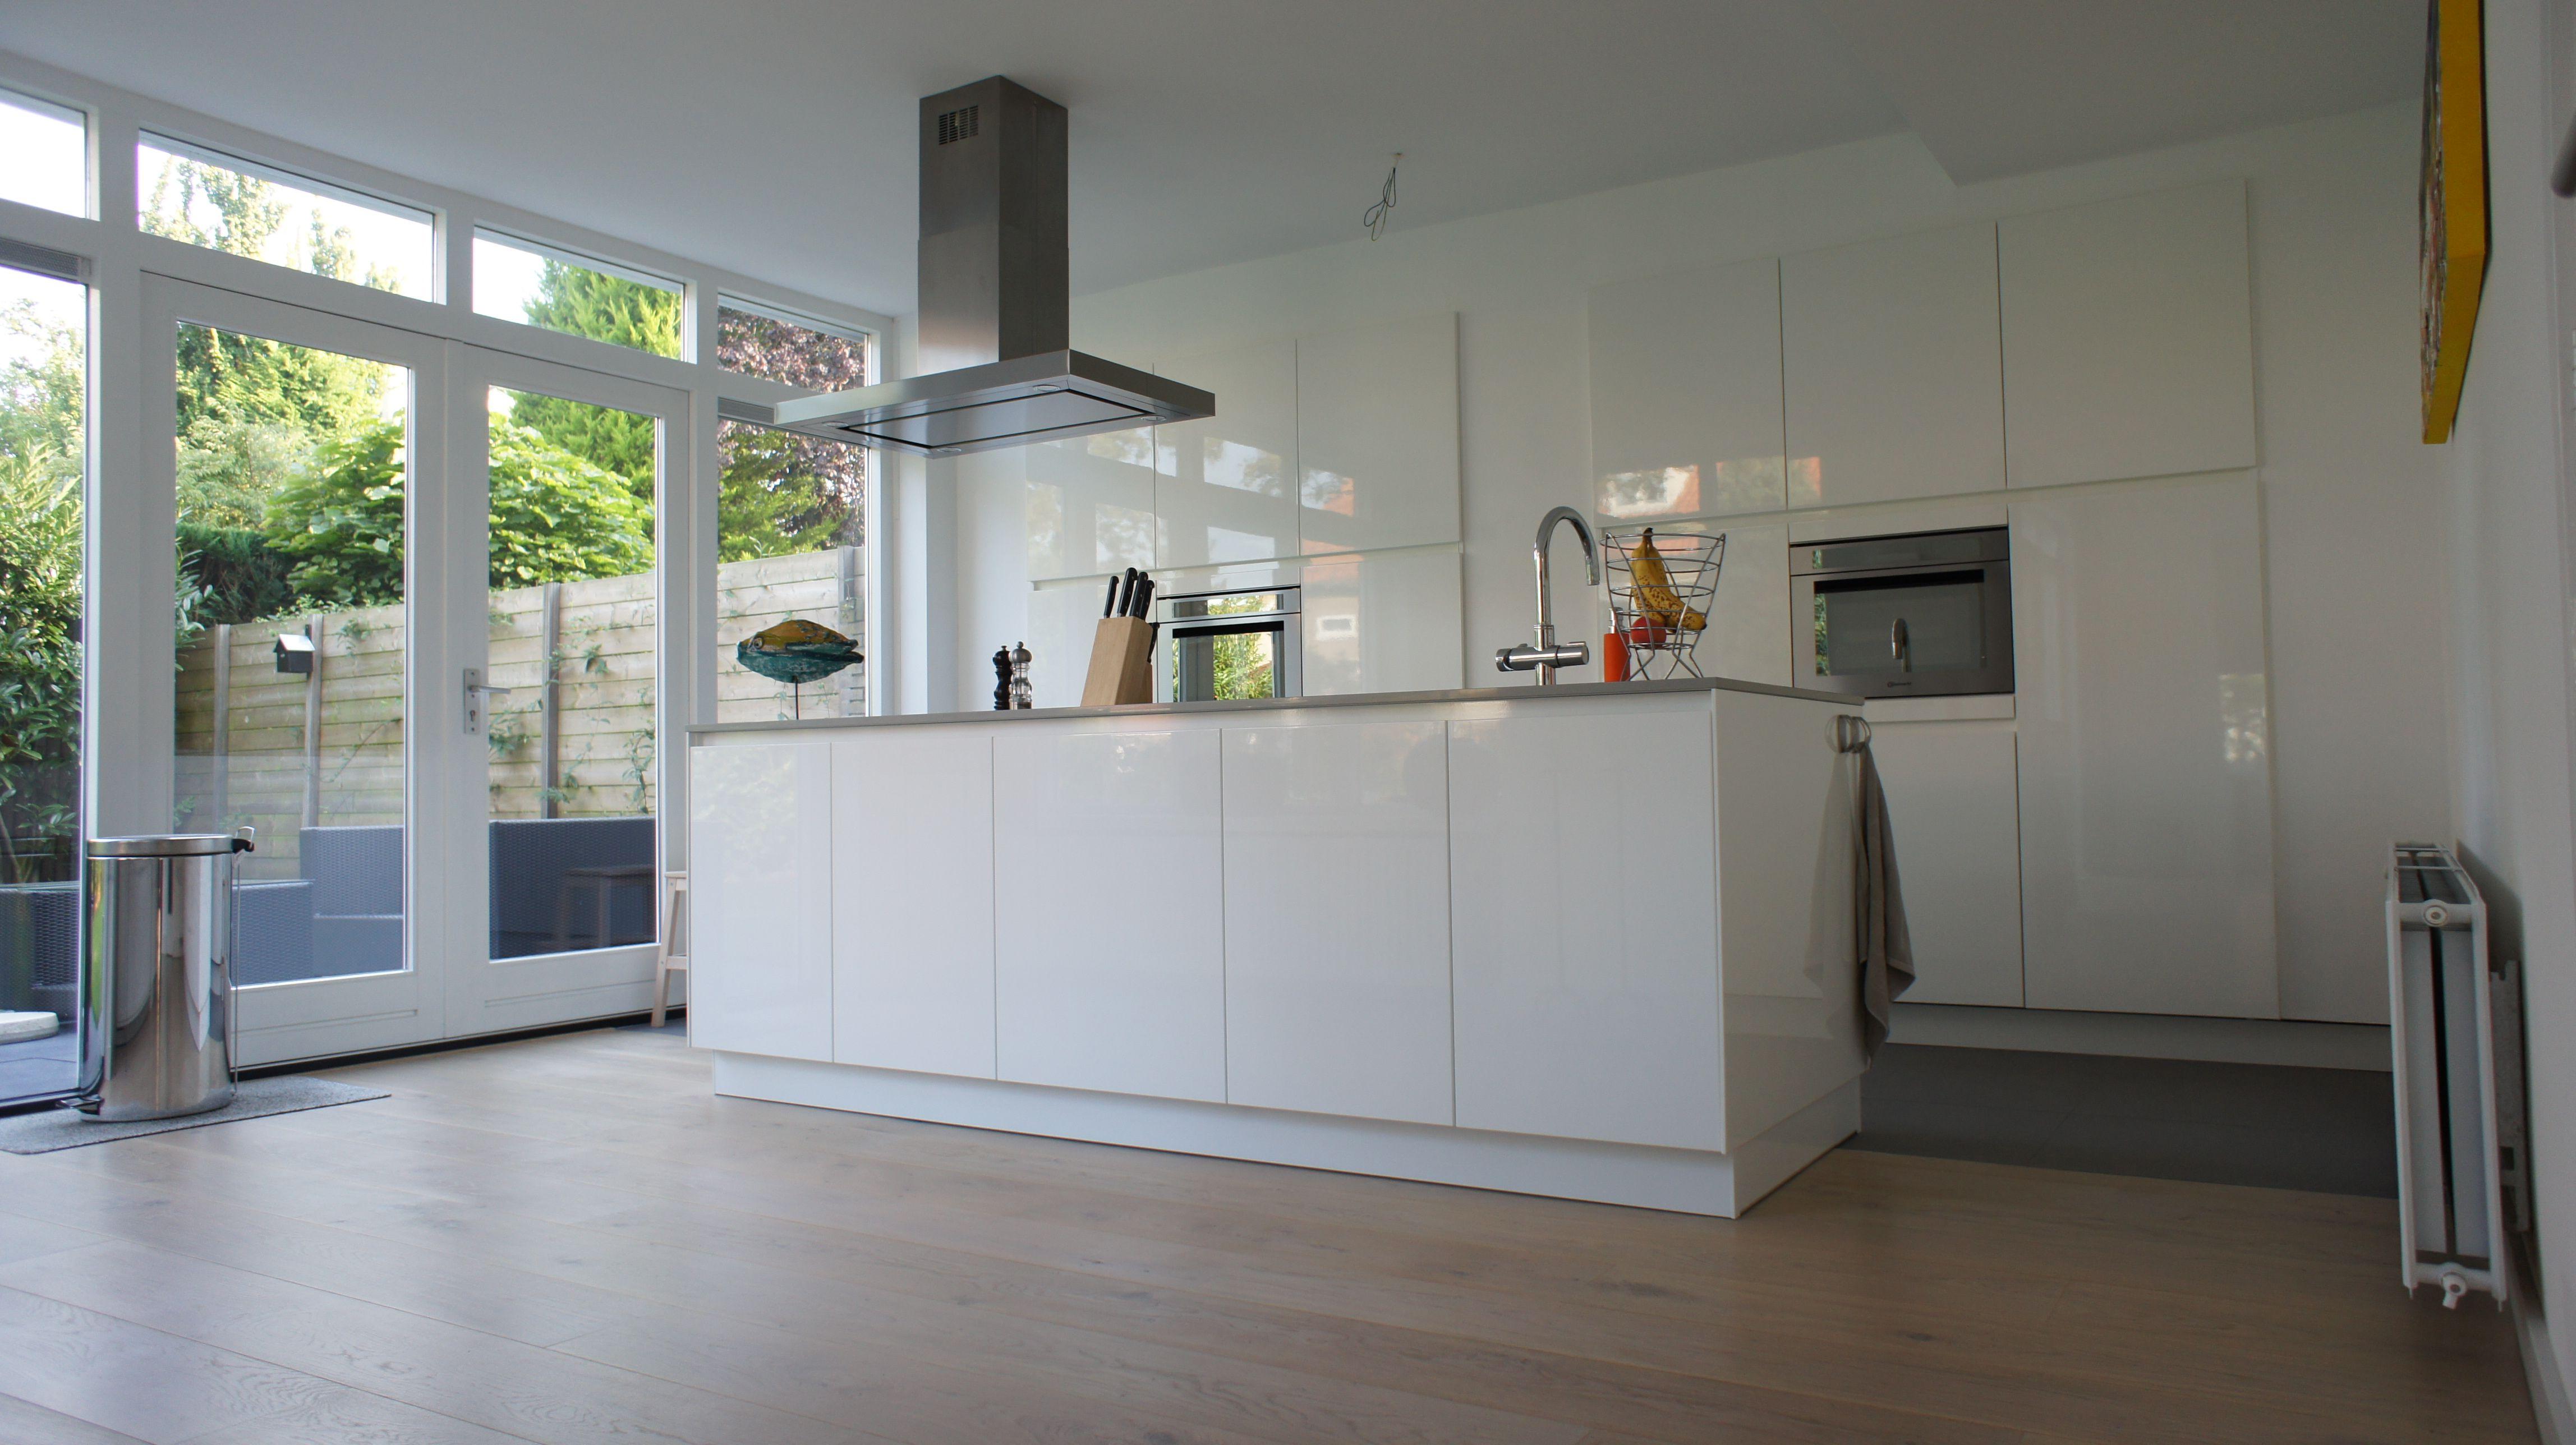 Ikea slaapkamer inspiraties - Keuken licht eiken ...